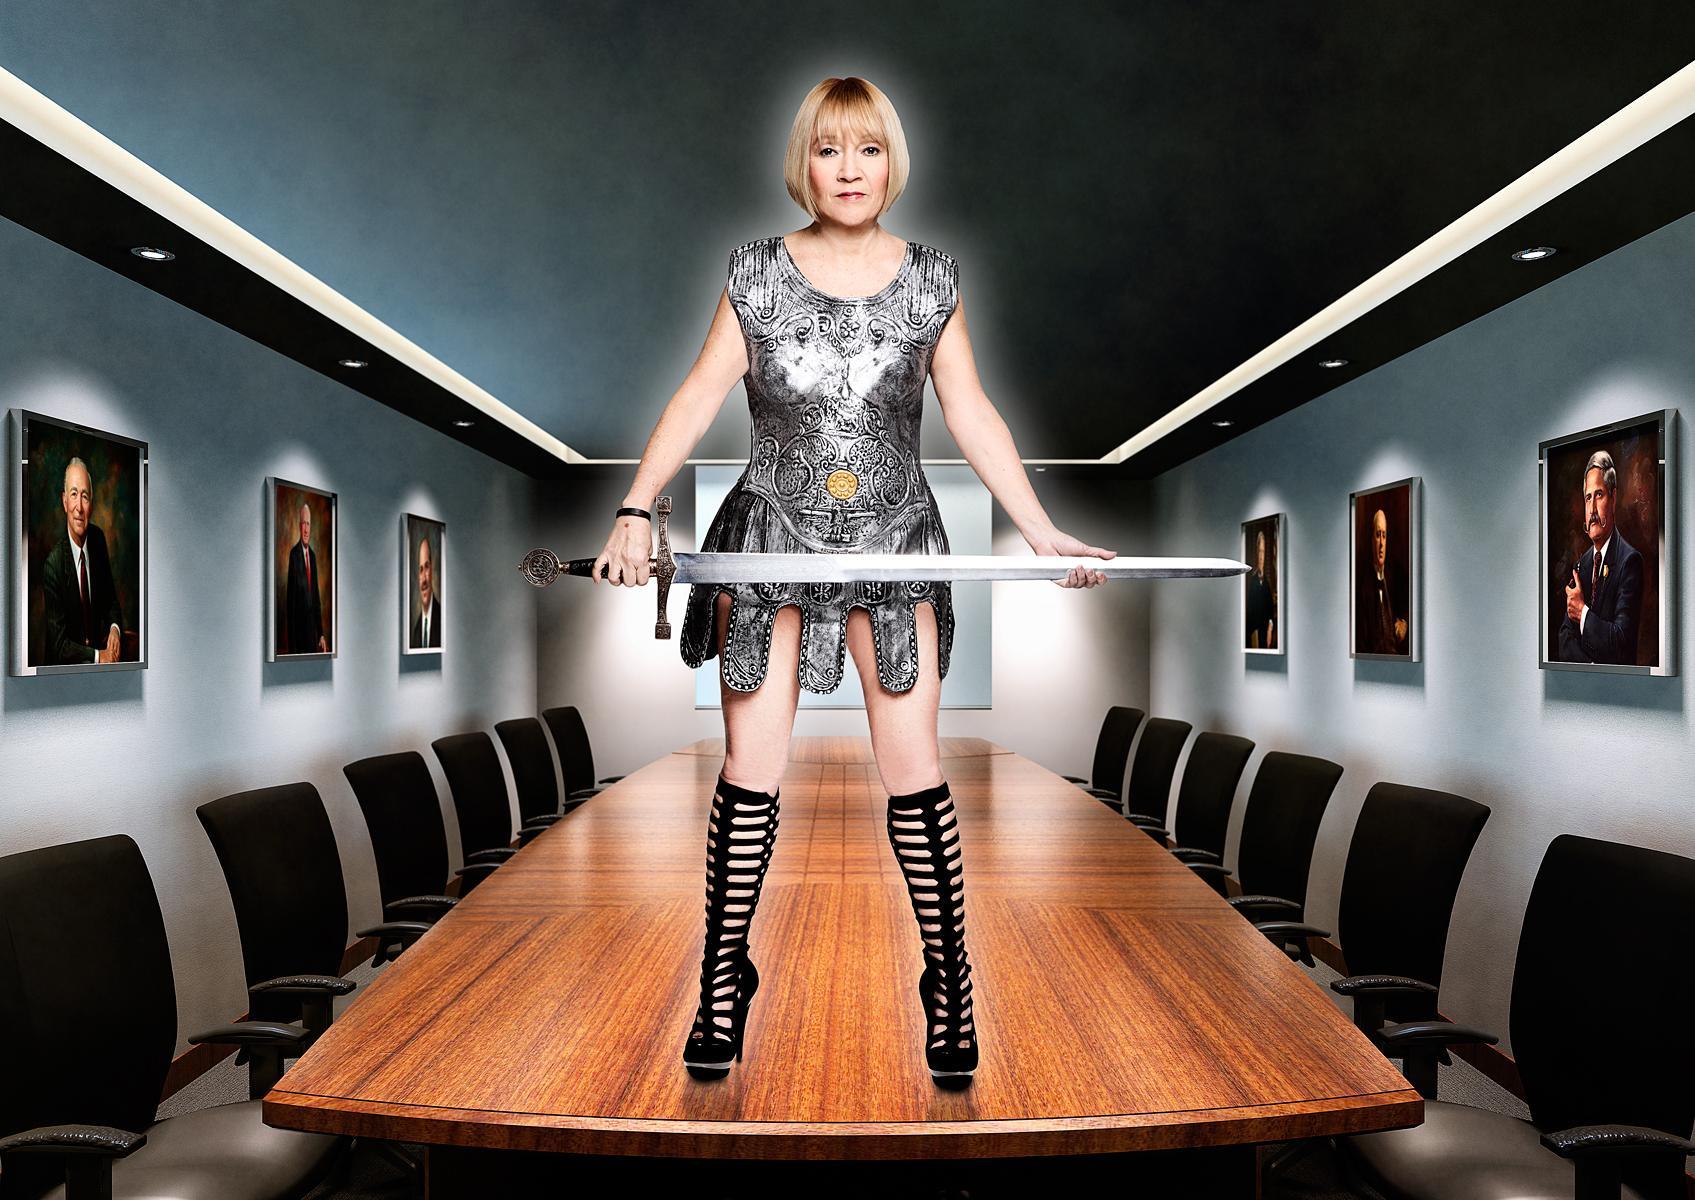 Cindy Gallop - Portrait by Julian Hanford